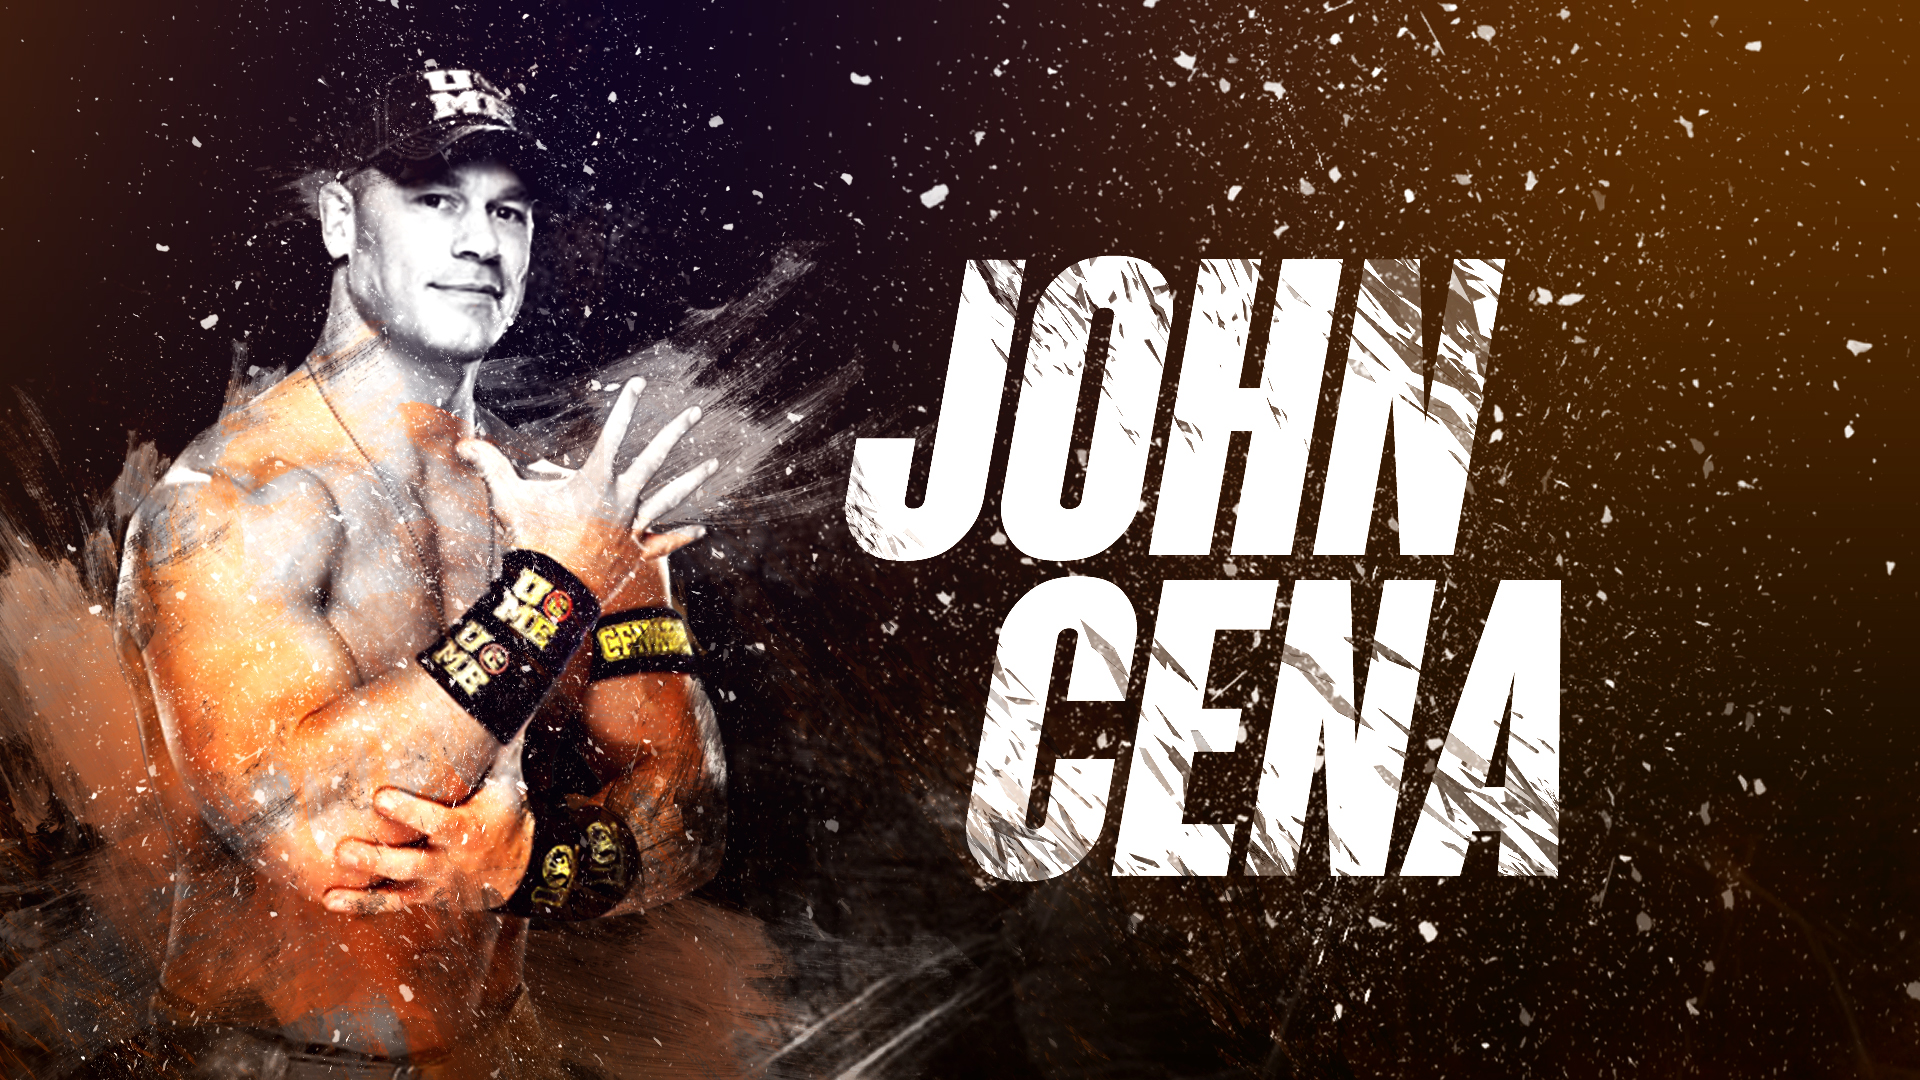 Free Download John Cena Hd Wallpapers 1920x1080 For Your Desktop